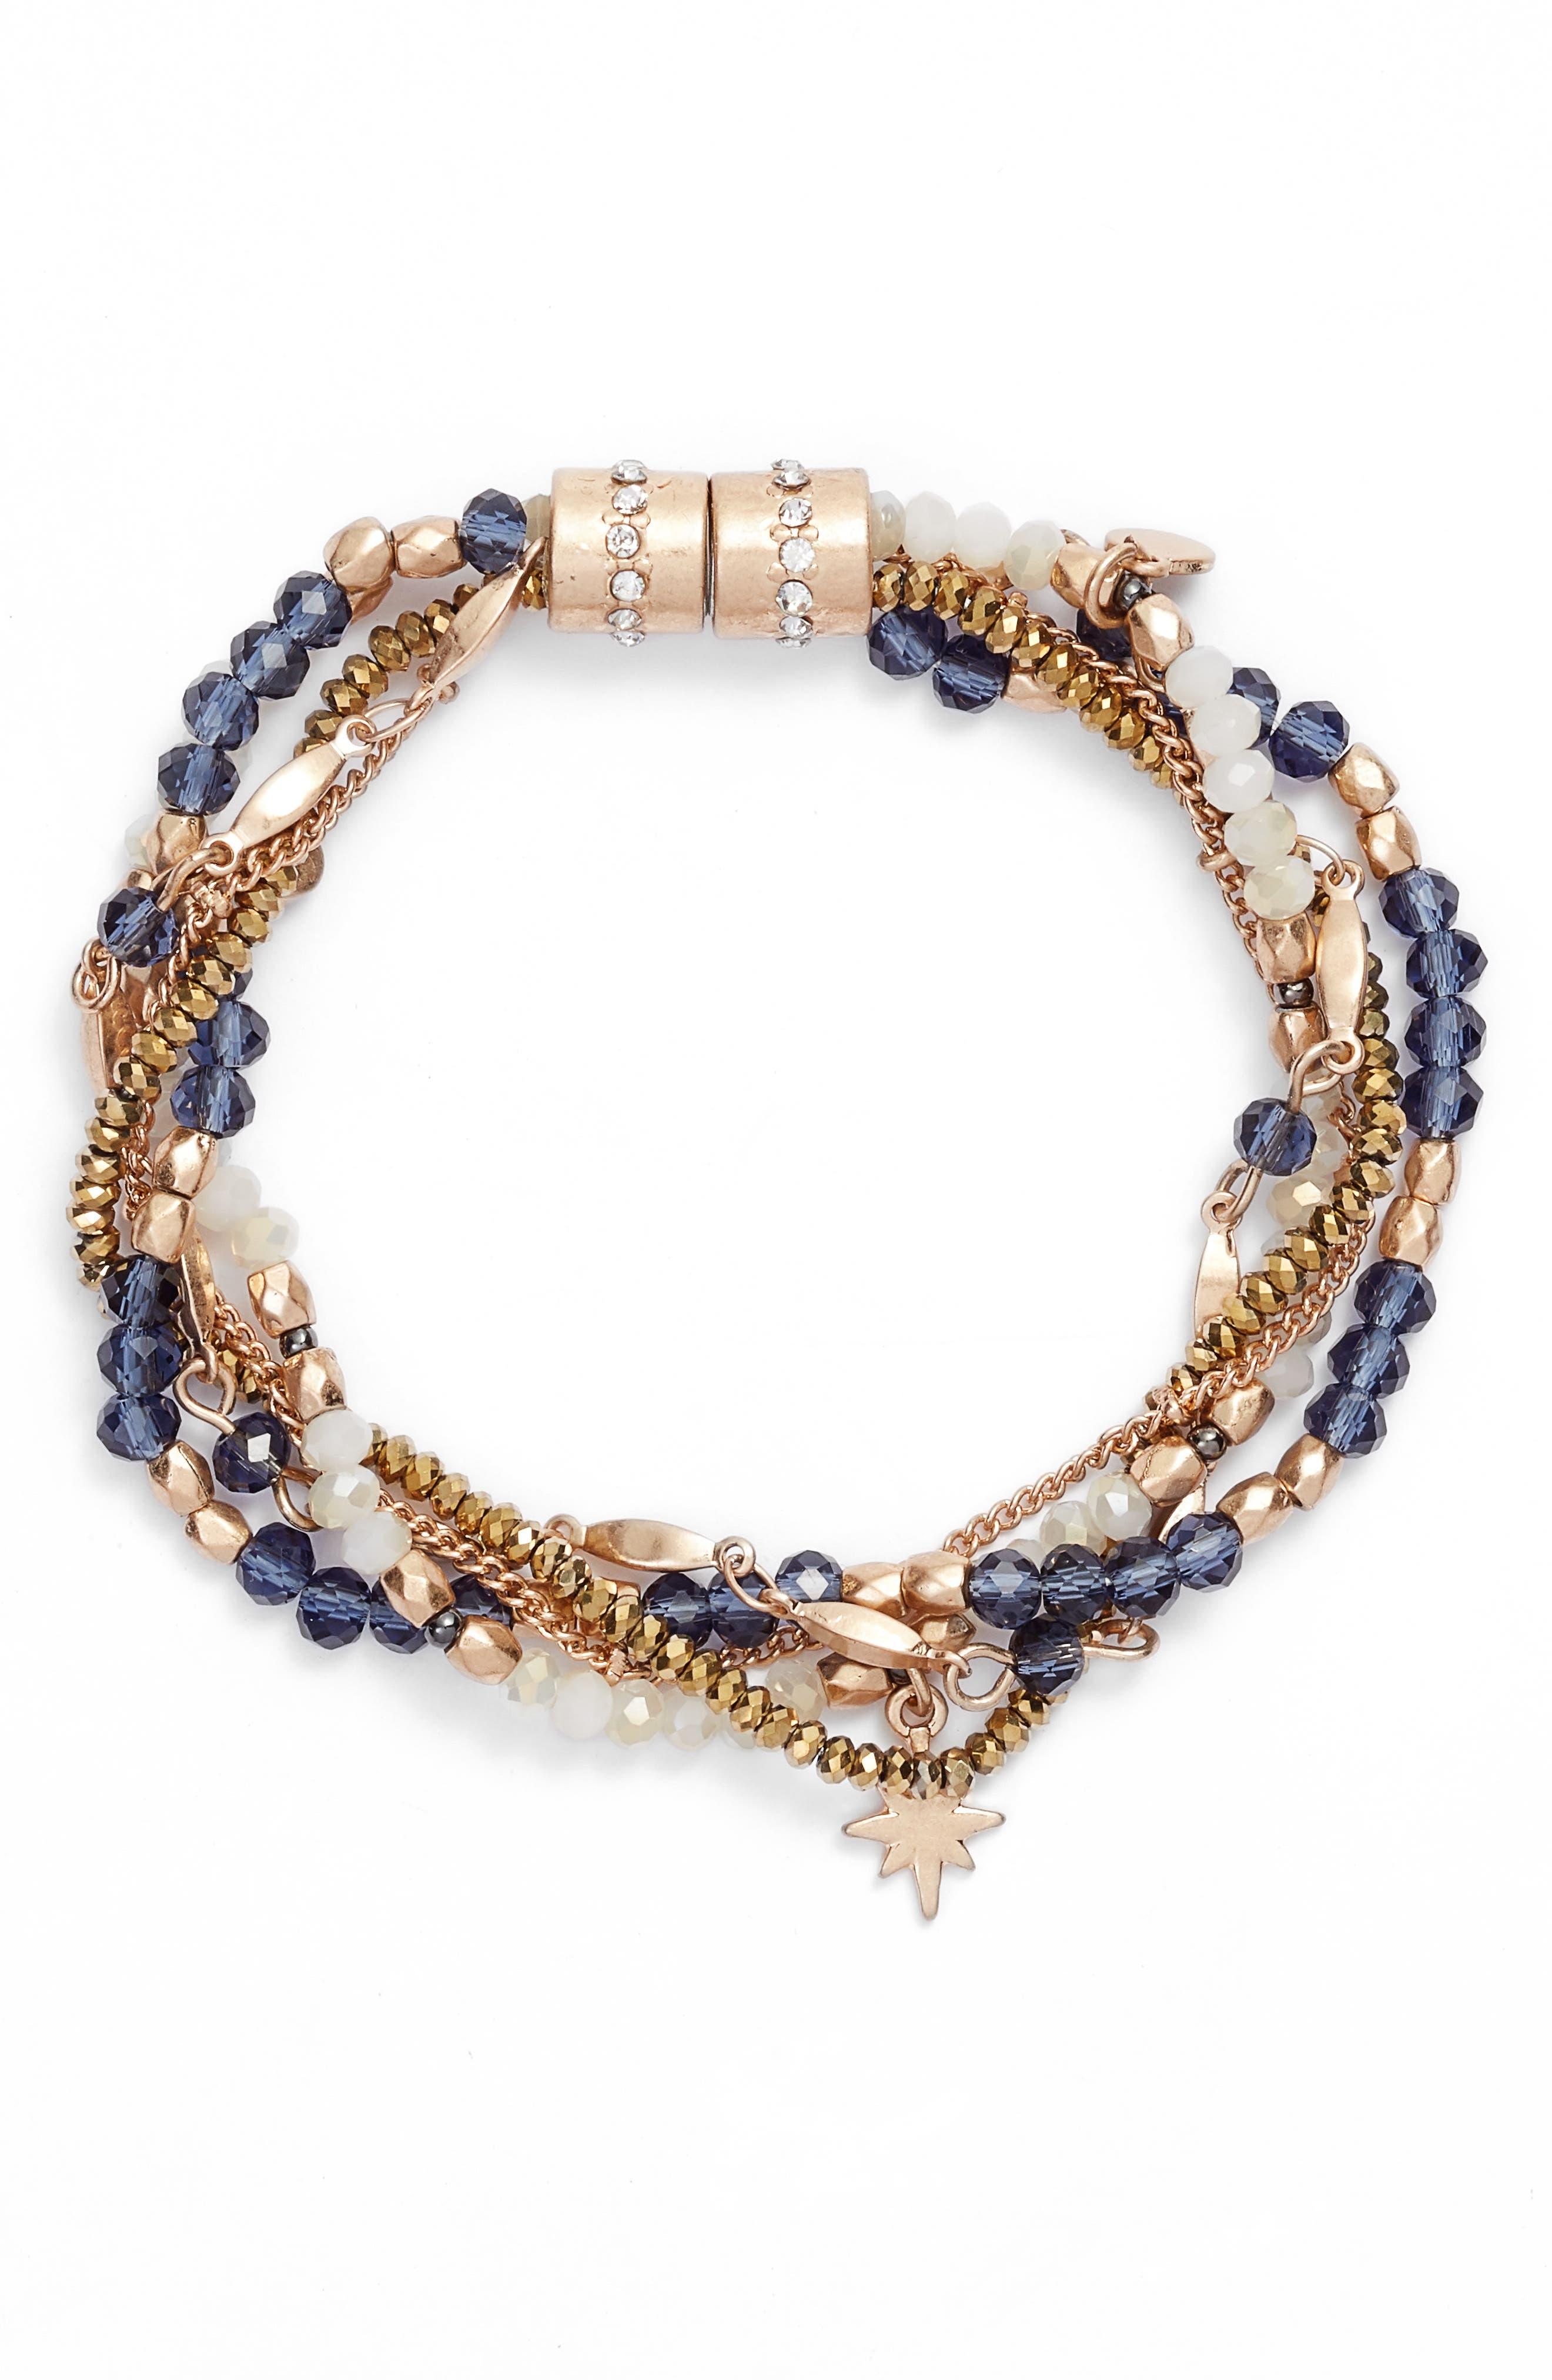 Layered Charm Bracelet,                             Main thumbnail 1, color,                             BLUE-/ GOLD